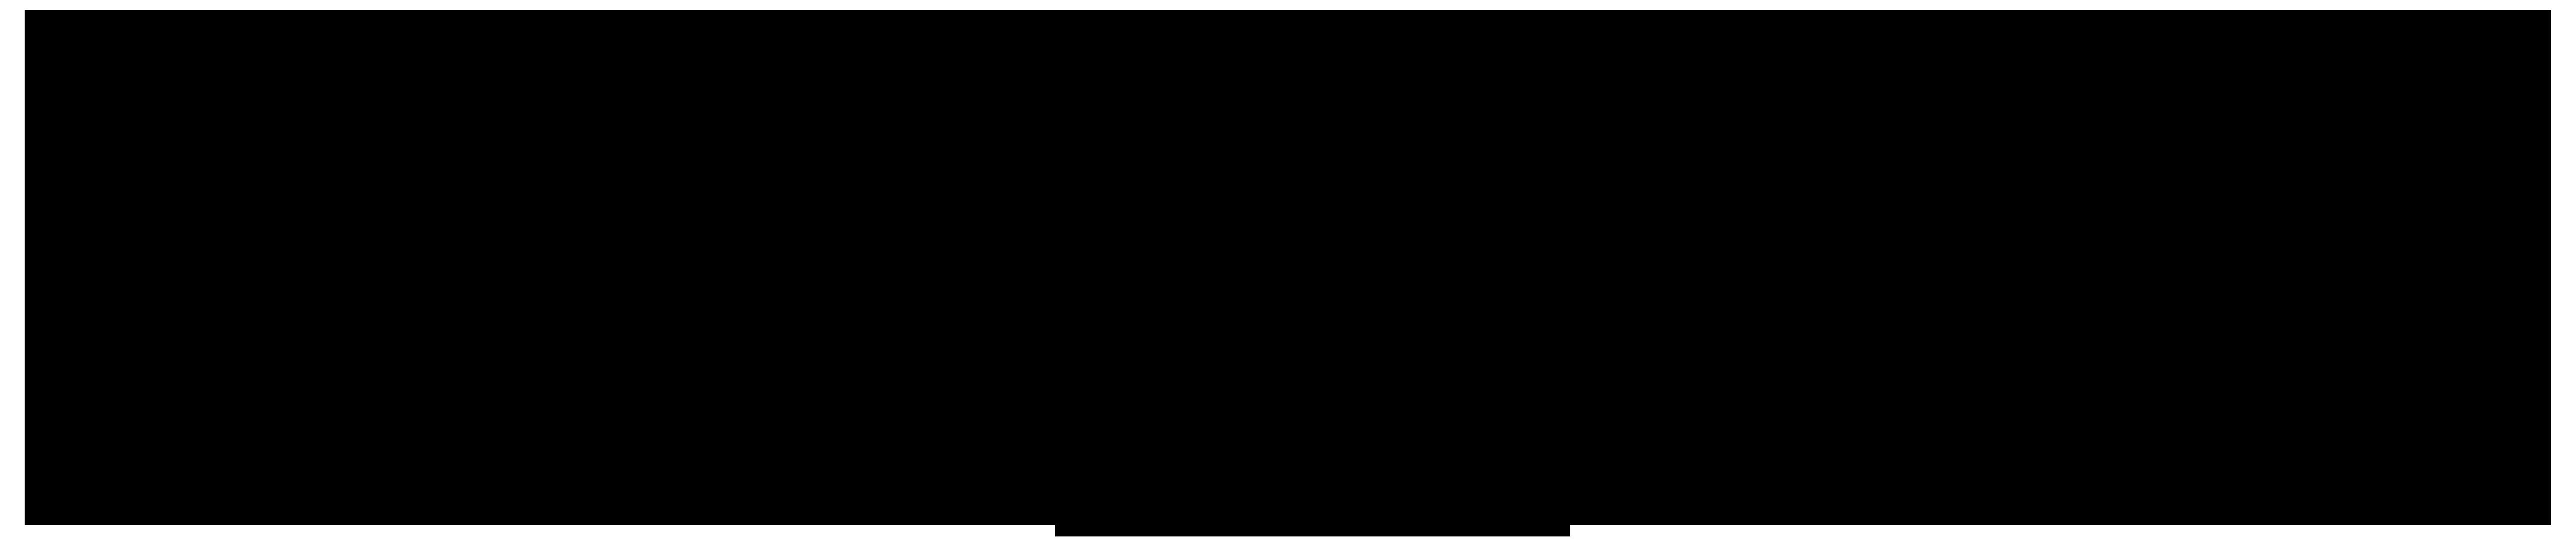 Massive Entertainment logo.